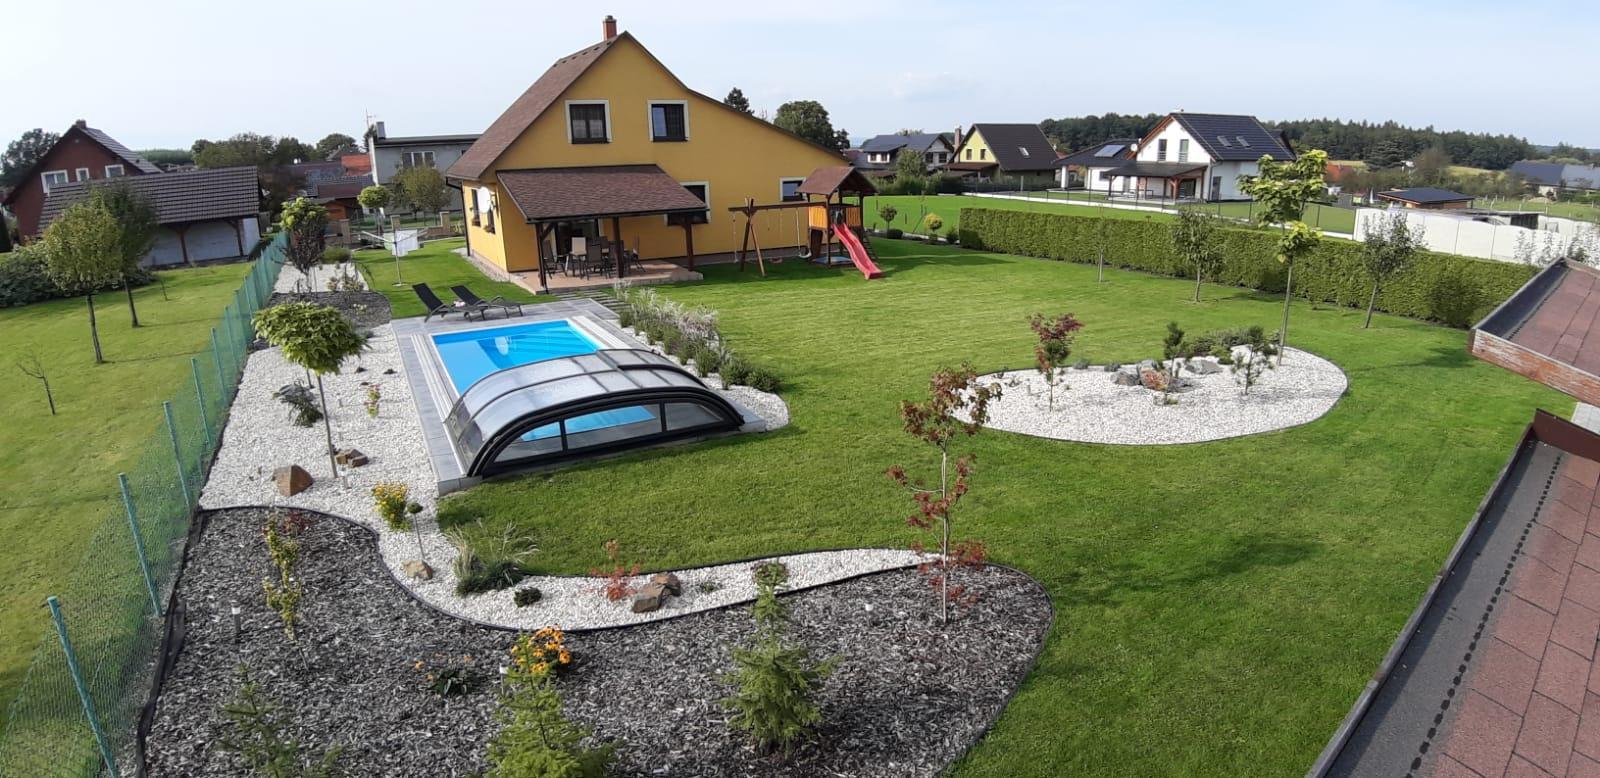 Zahrada 2020 - Obrázek č. 36